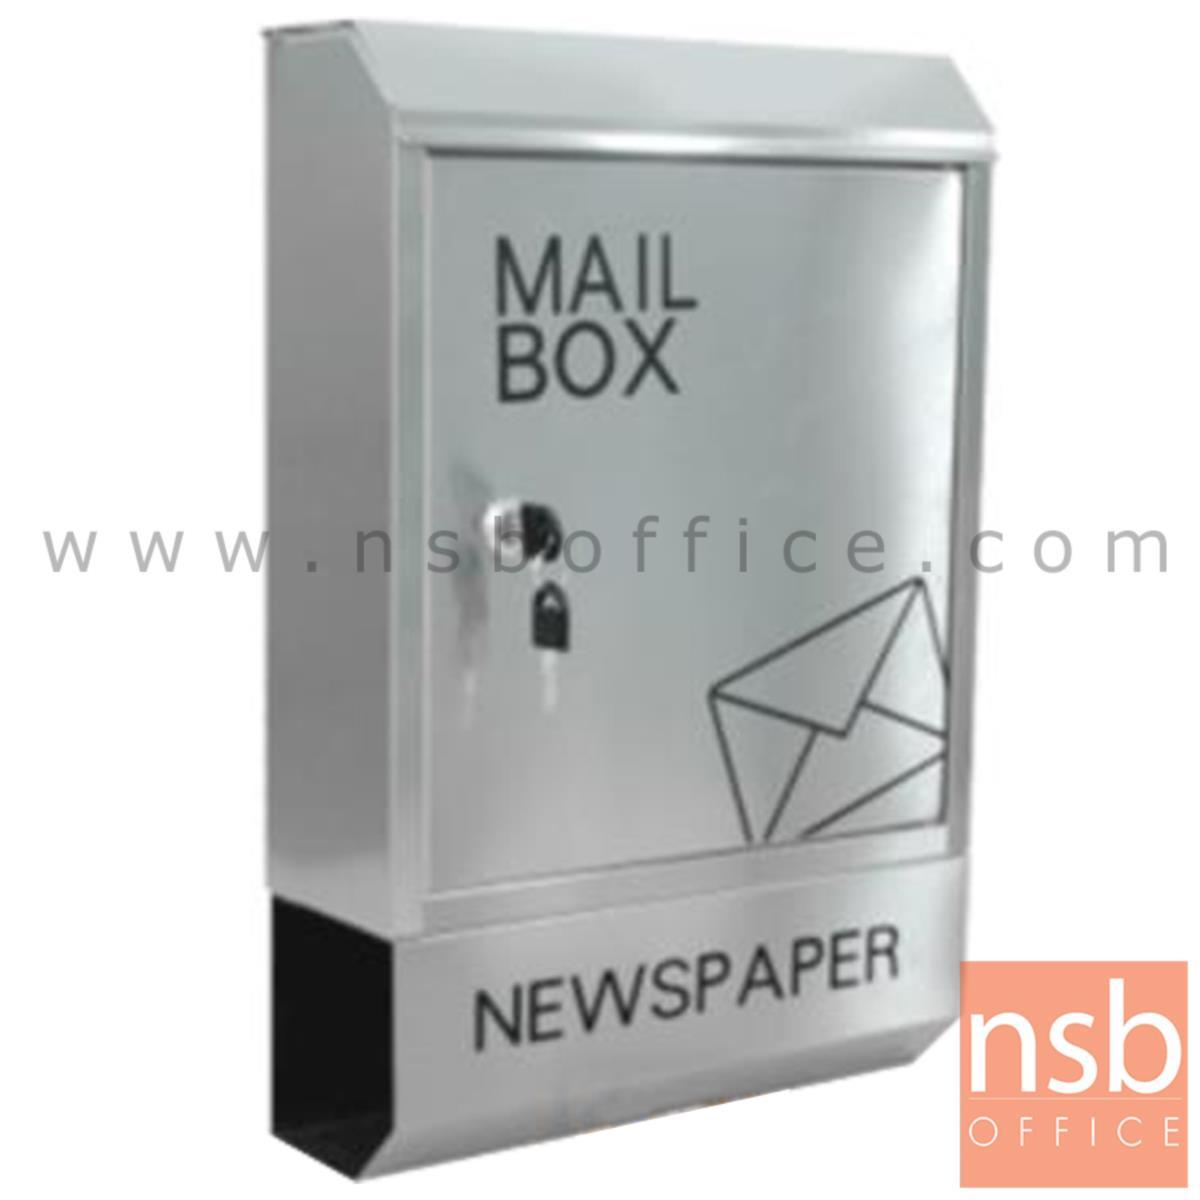 G15A015:ตู้จดหมายเหล็ก รุ่น MAIL BOX-053 มีกุญแจล็อคหน้าตู้